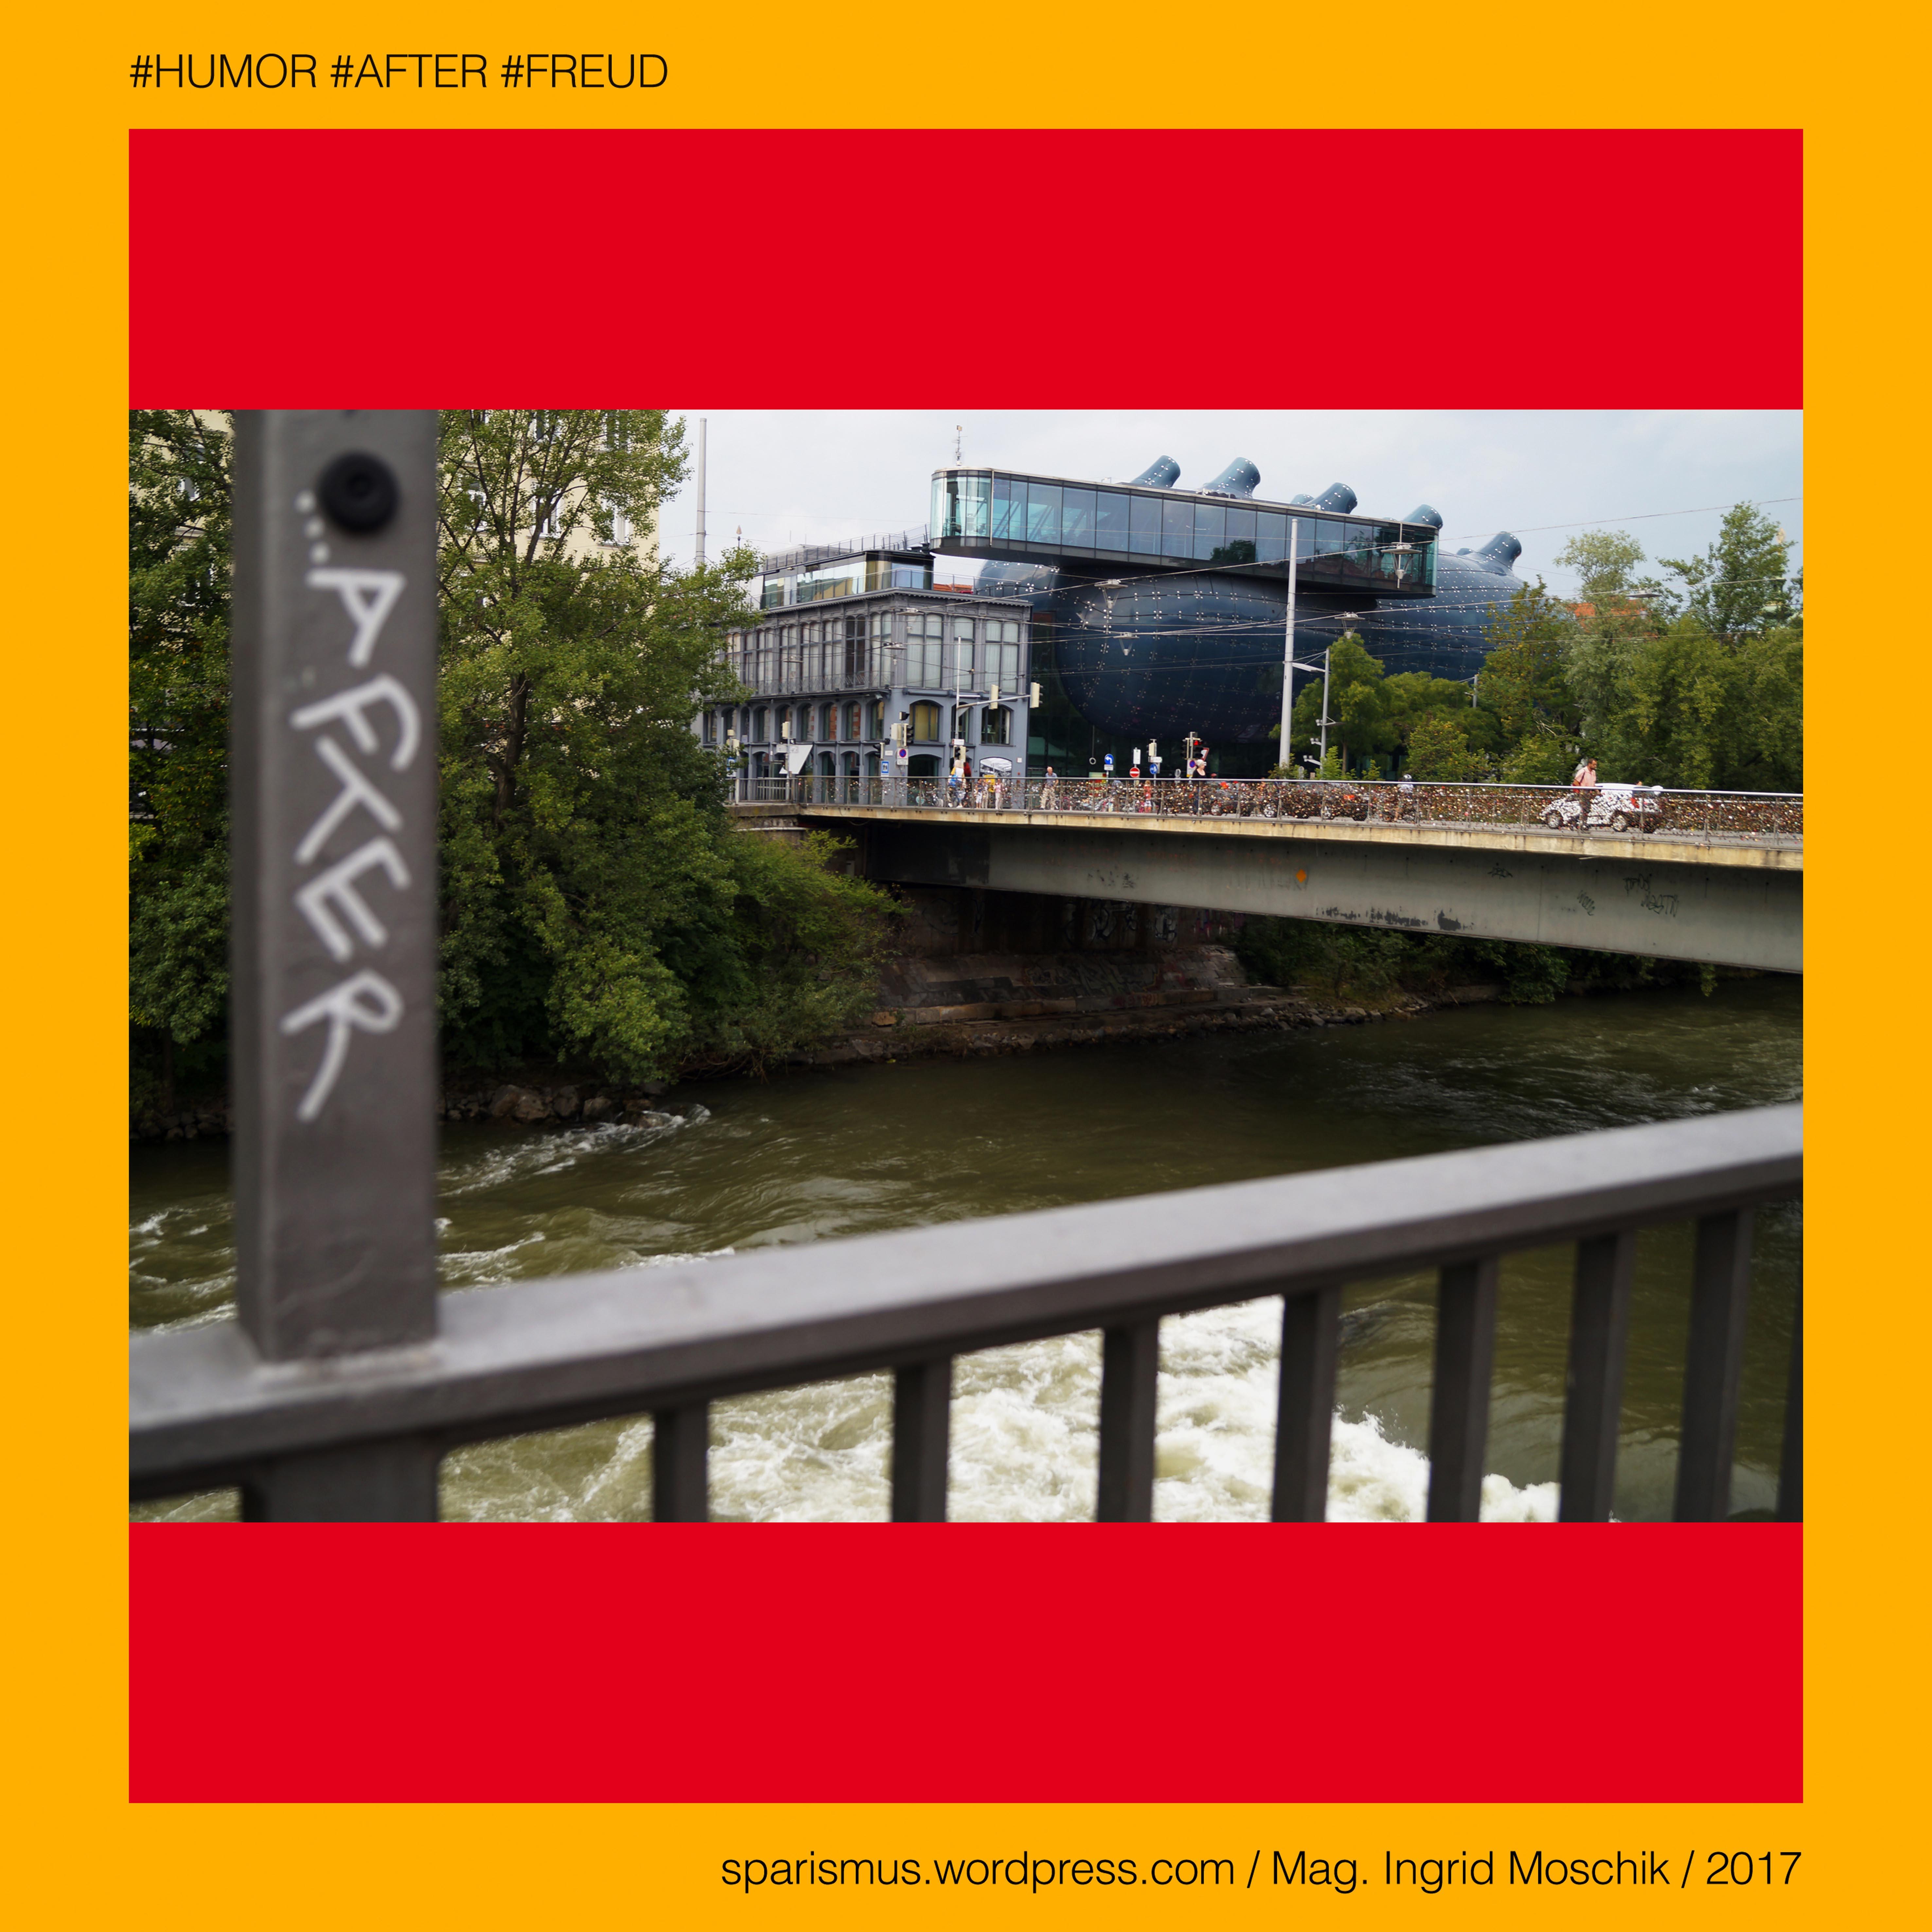 HUMOR AFTER FREUD – KUNSTHAUS GRAZ – Erzherzog Johann Hauptbrücke Mur Marburger Kai 21 R2 Murradweg 28 August 2017